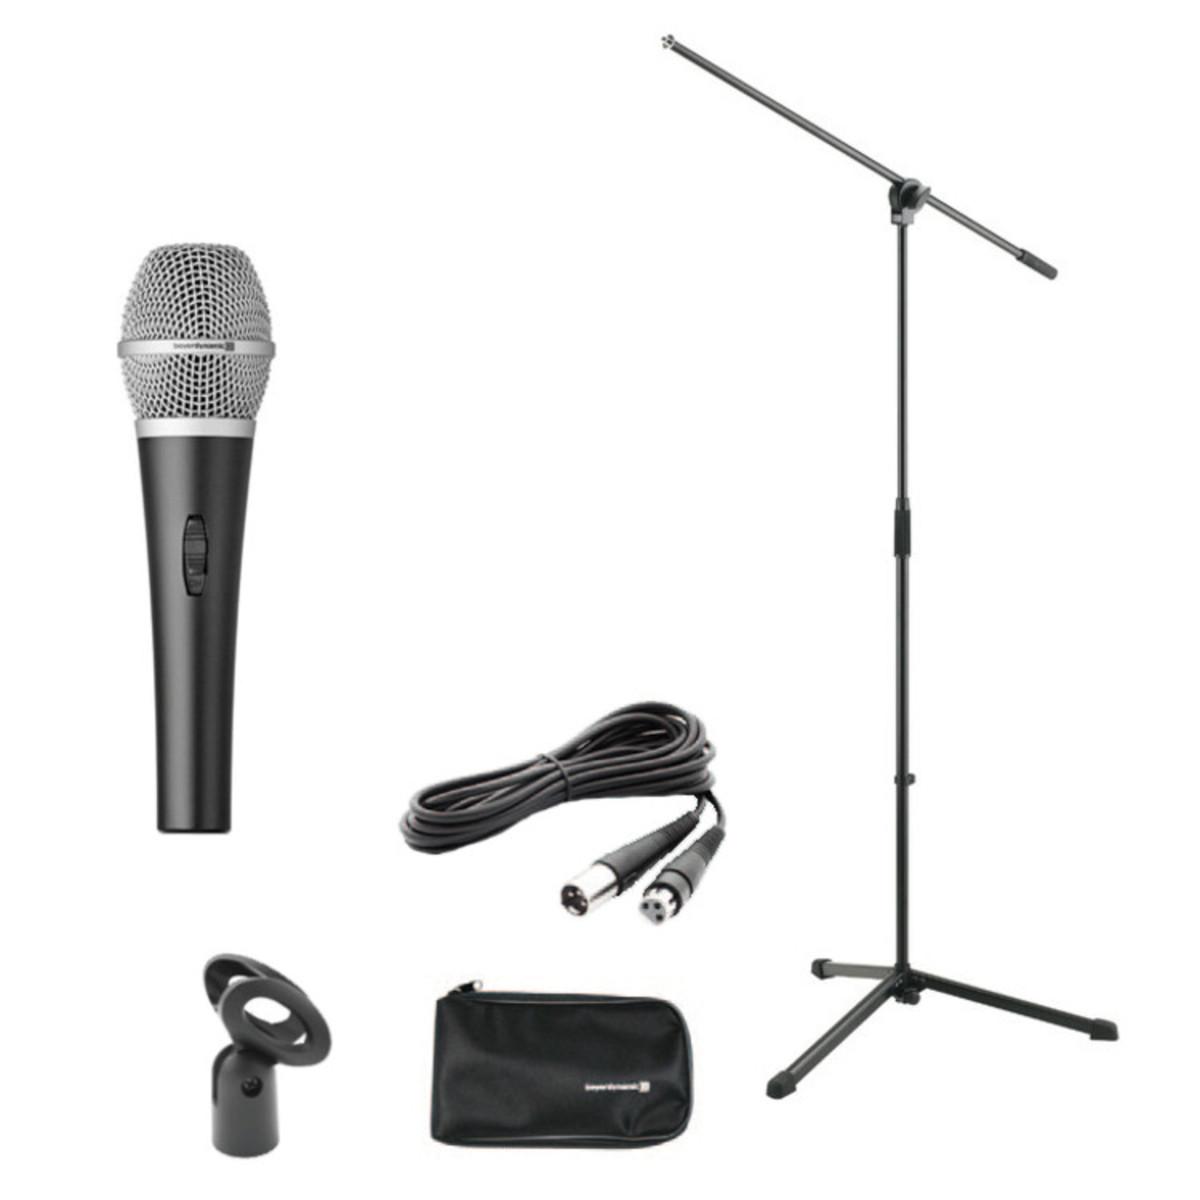 Beyerdynamic V35d S Microphone Set Including Boom Stand